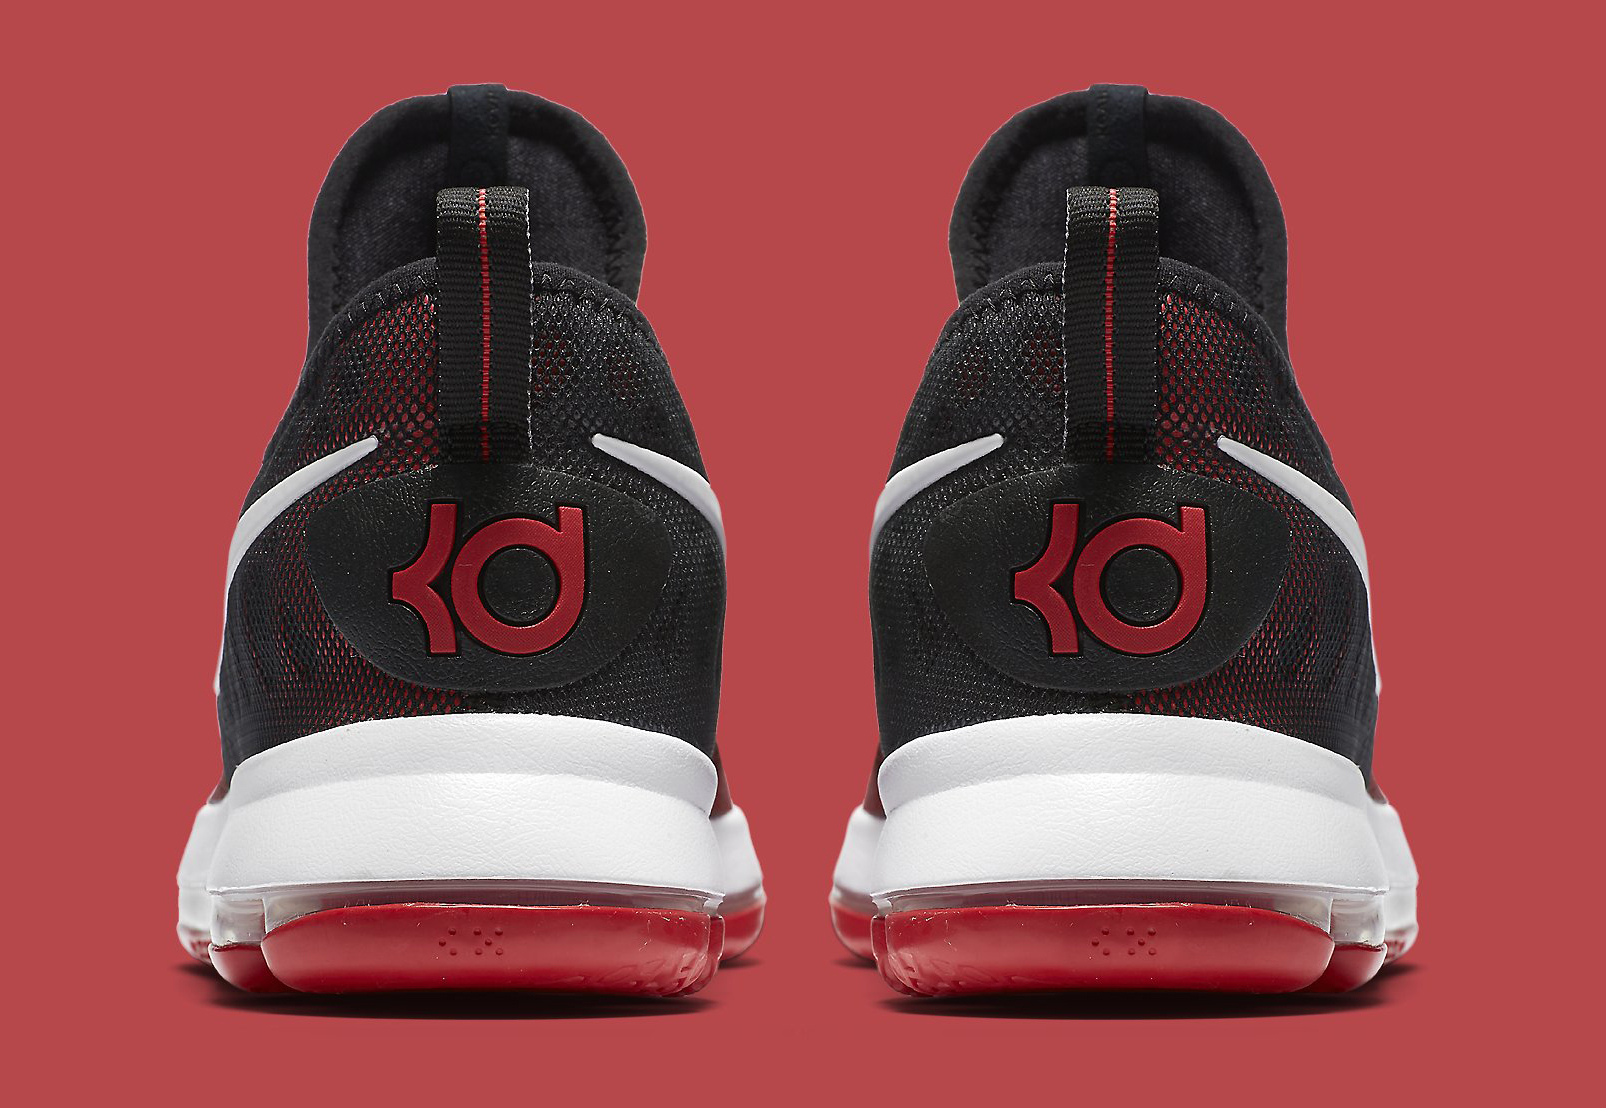 29ae8a065c0b Nike KD 9 Red Black White 843392-610